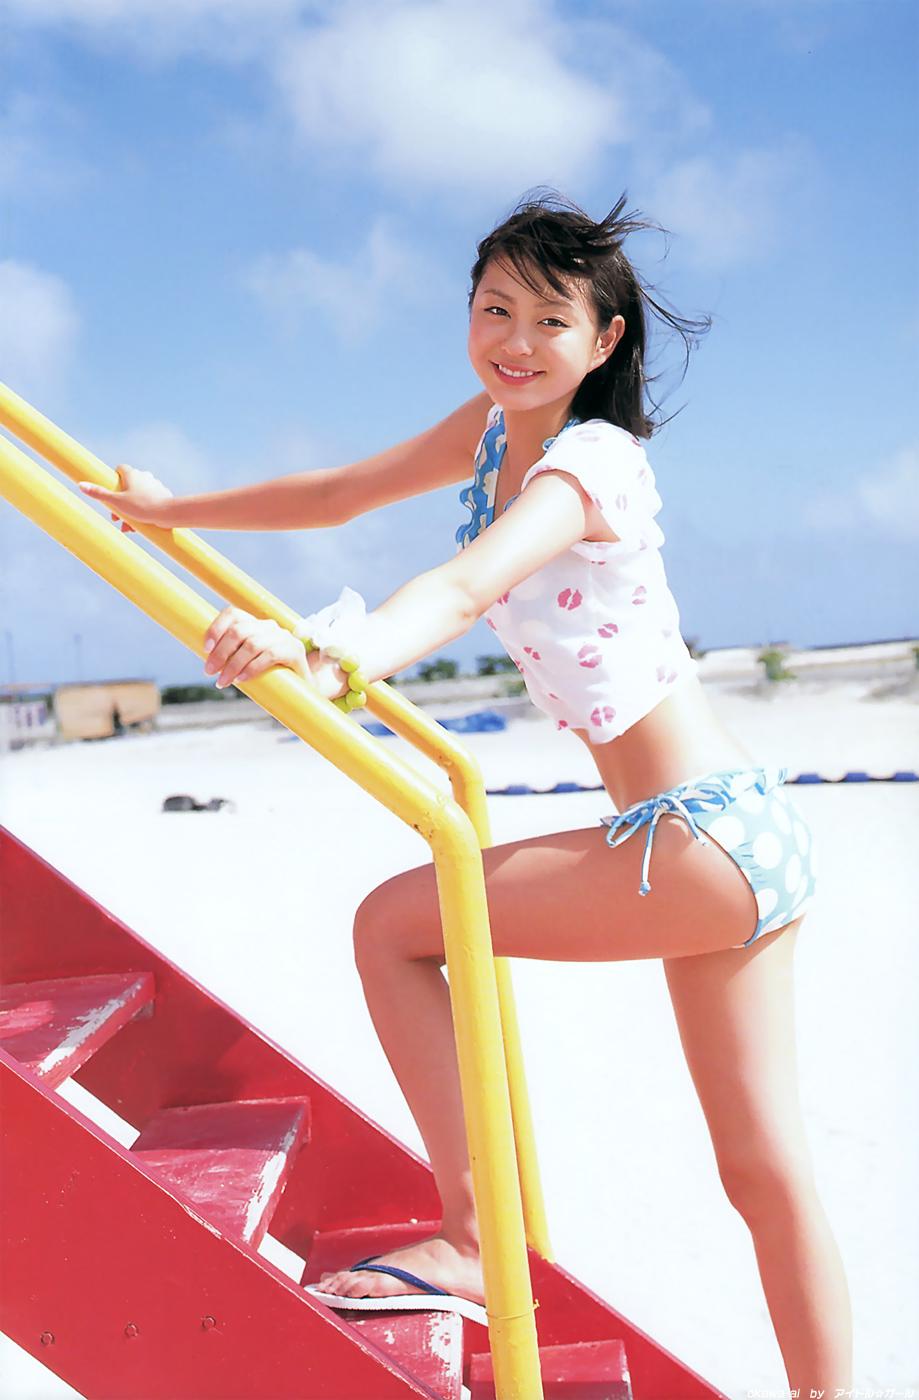 image http://scanlover.com/assets/images/47-azrup9CllUDrB41i.jpeg